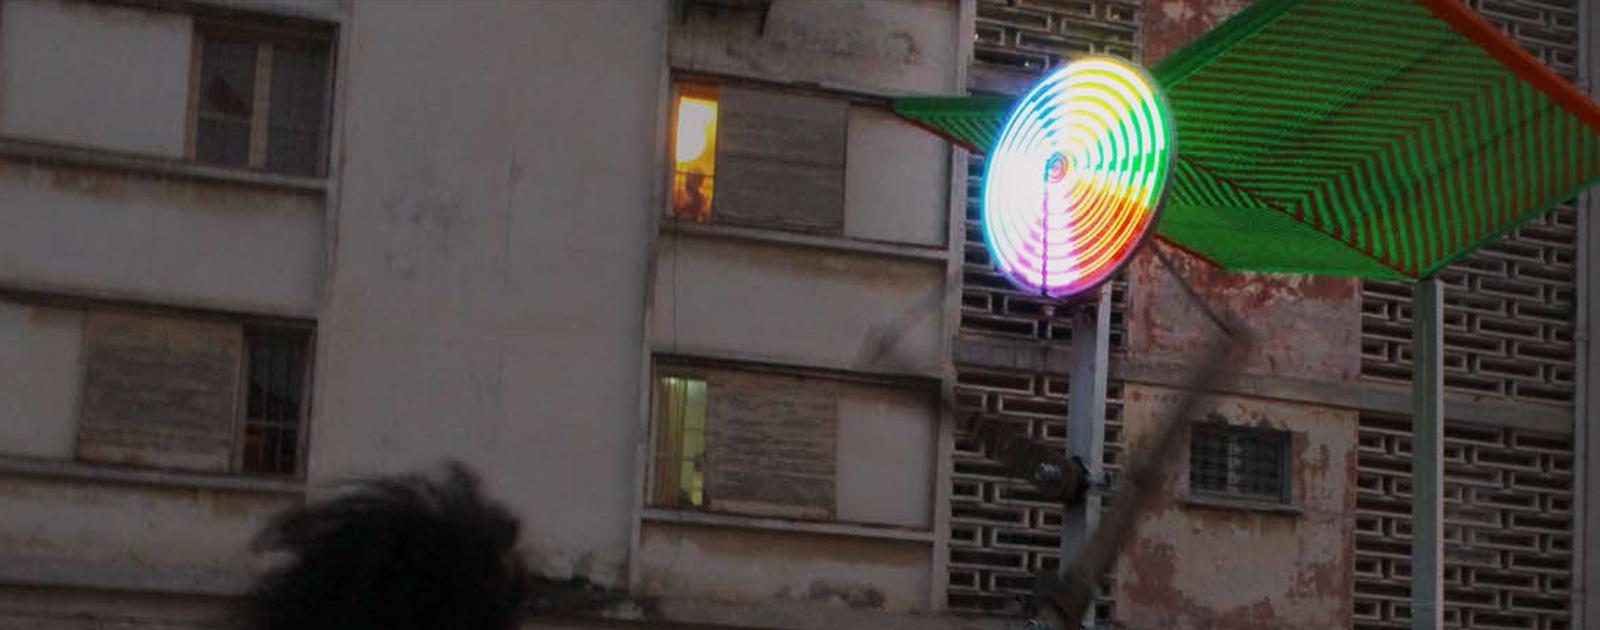 GriGri Pixel // Objets urbains du bien commun